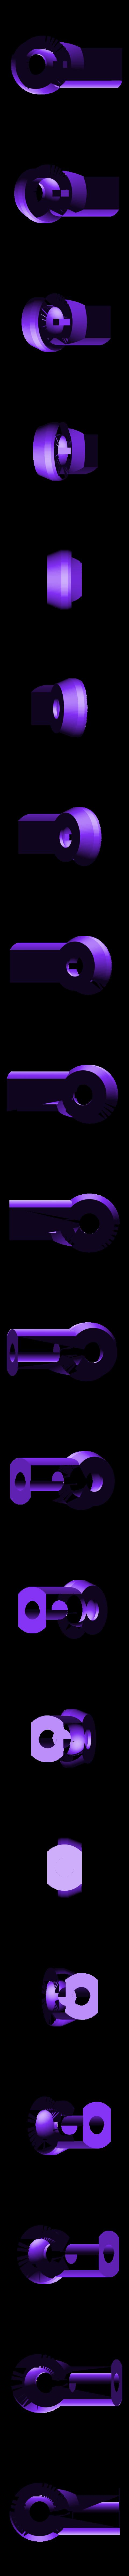 MRCC_OBTS_ST_BalljointExtreme_Small.STL Download STL file MyRCCar 1/10 On-Road Build for Tesla Model S Body RC Car • 3D print object, dlb5